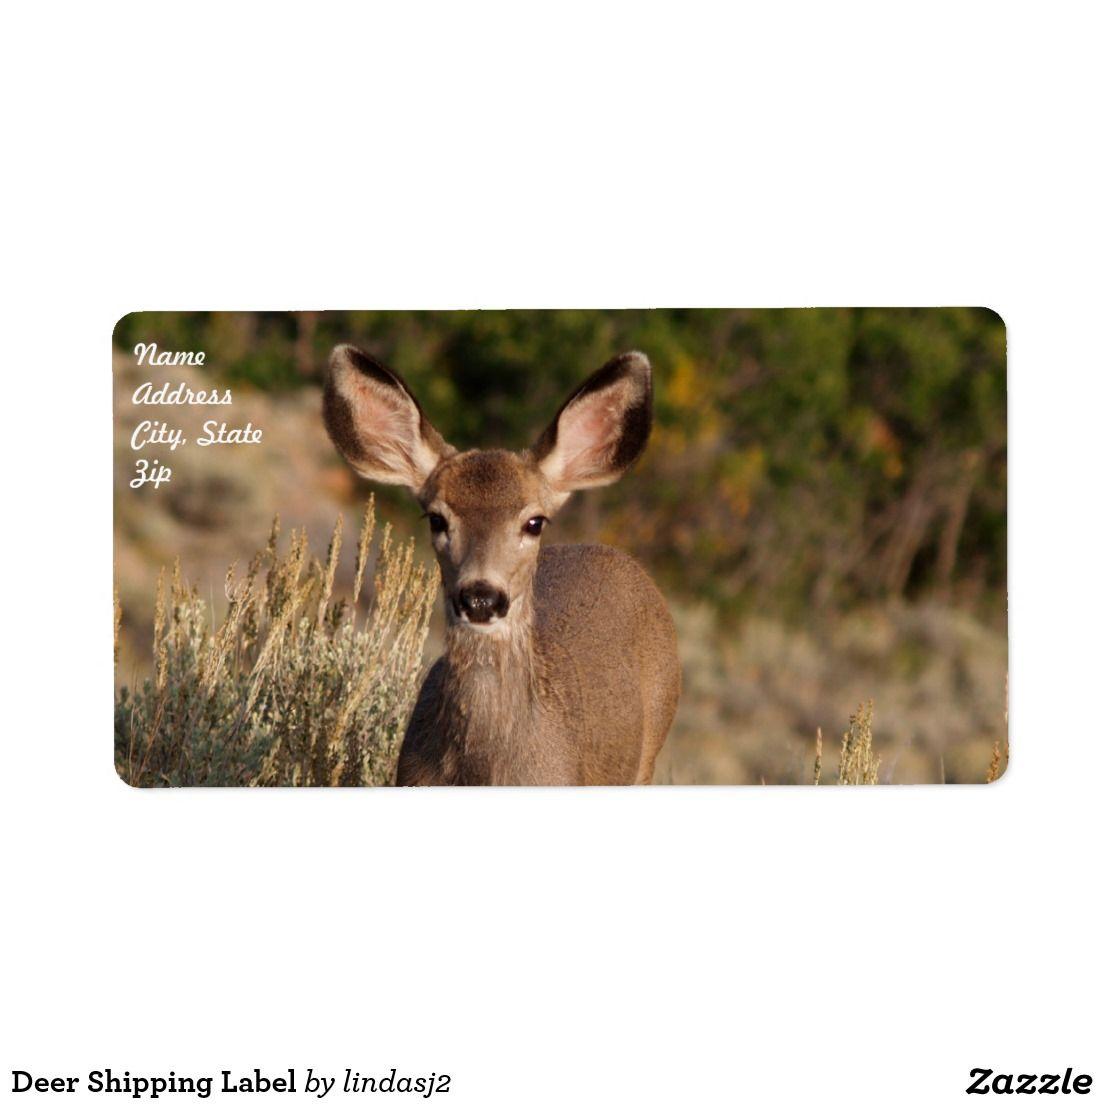 Deer Shipping Label